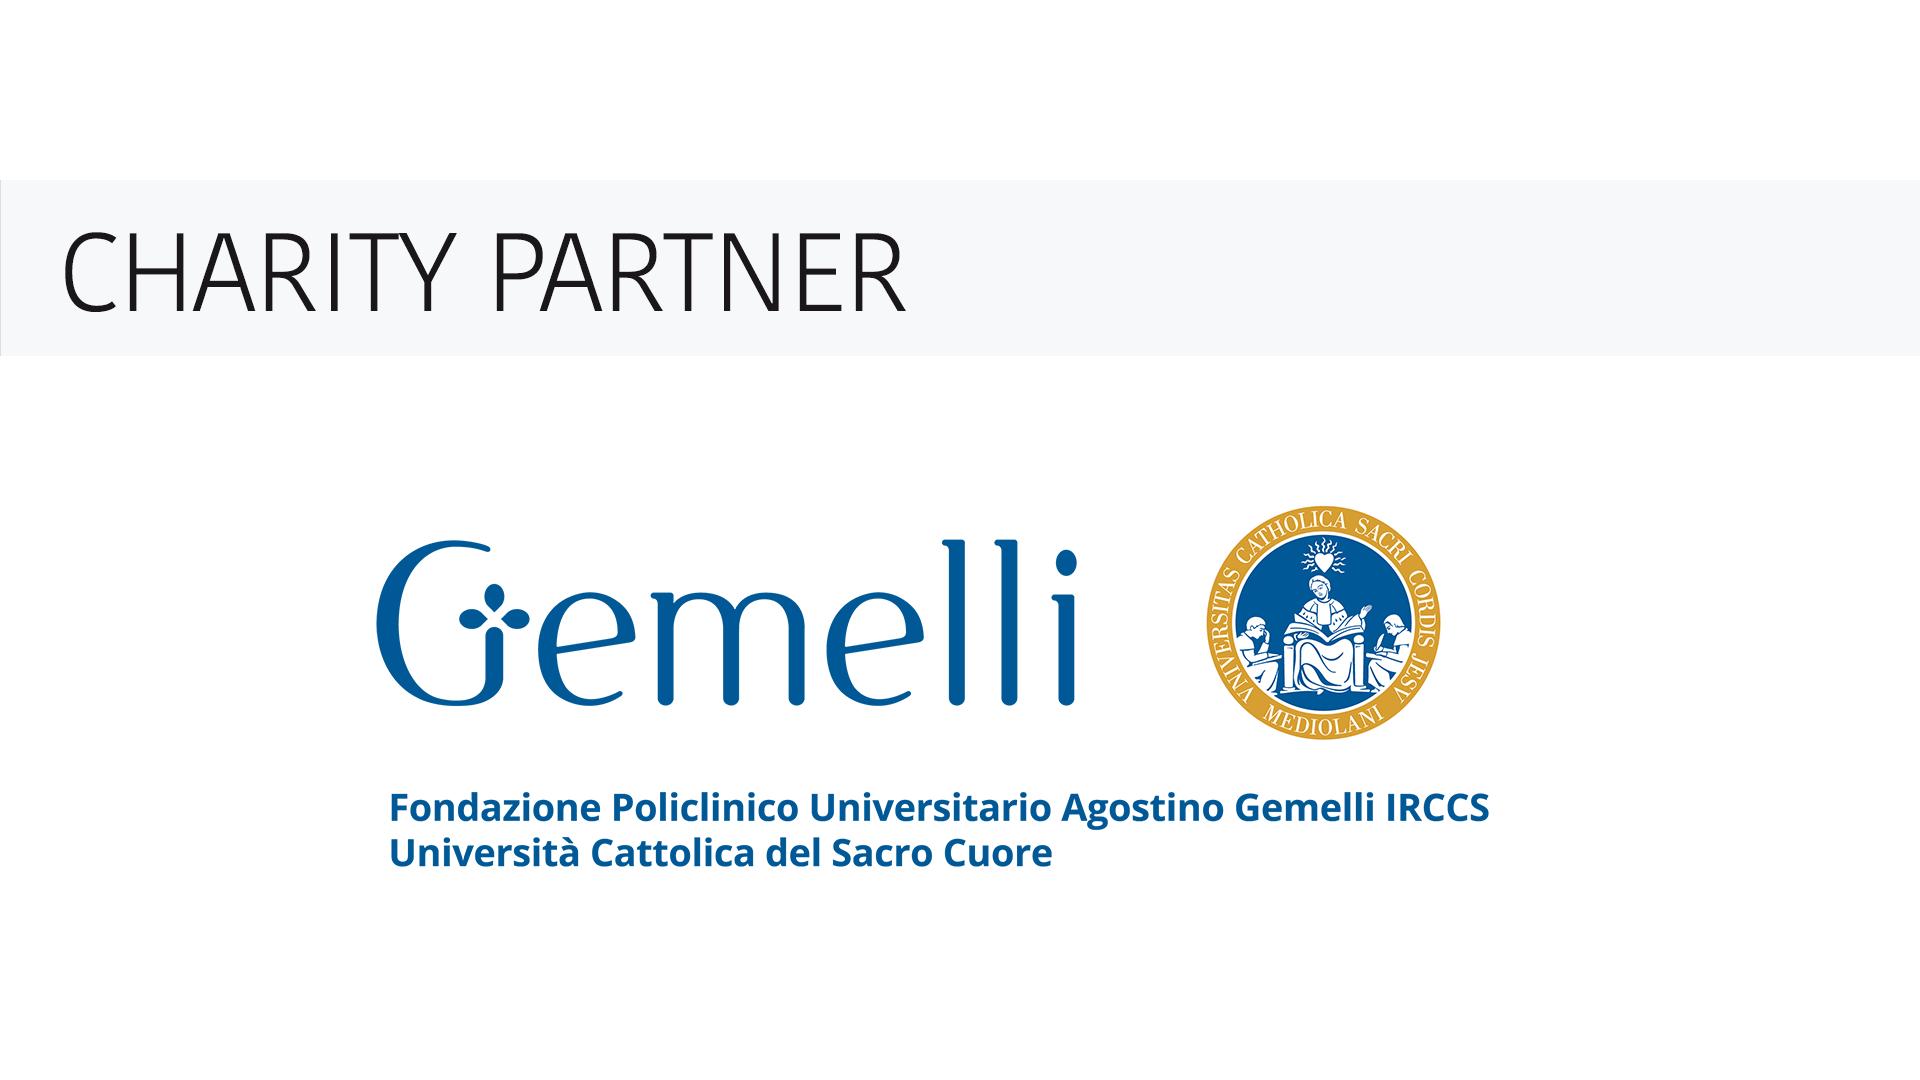 GEMELLI_charity partner